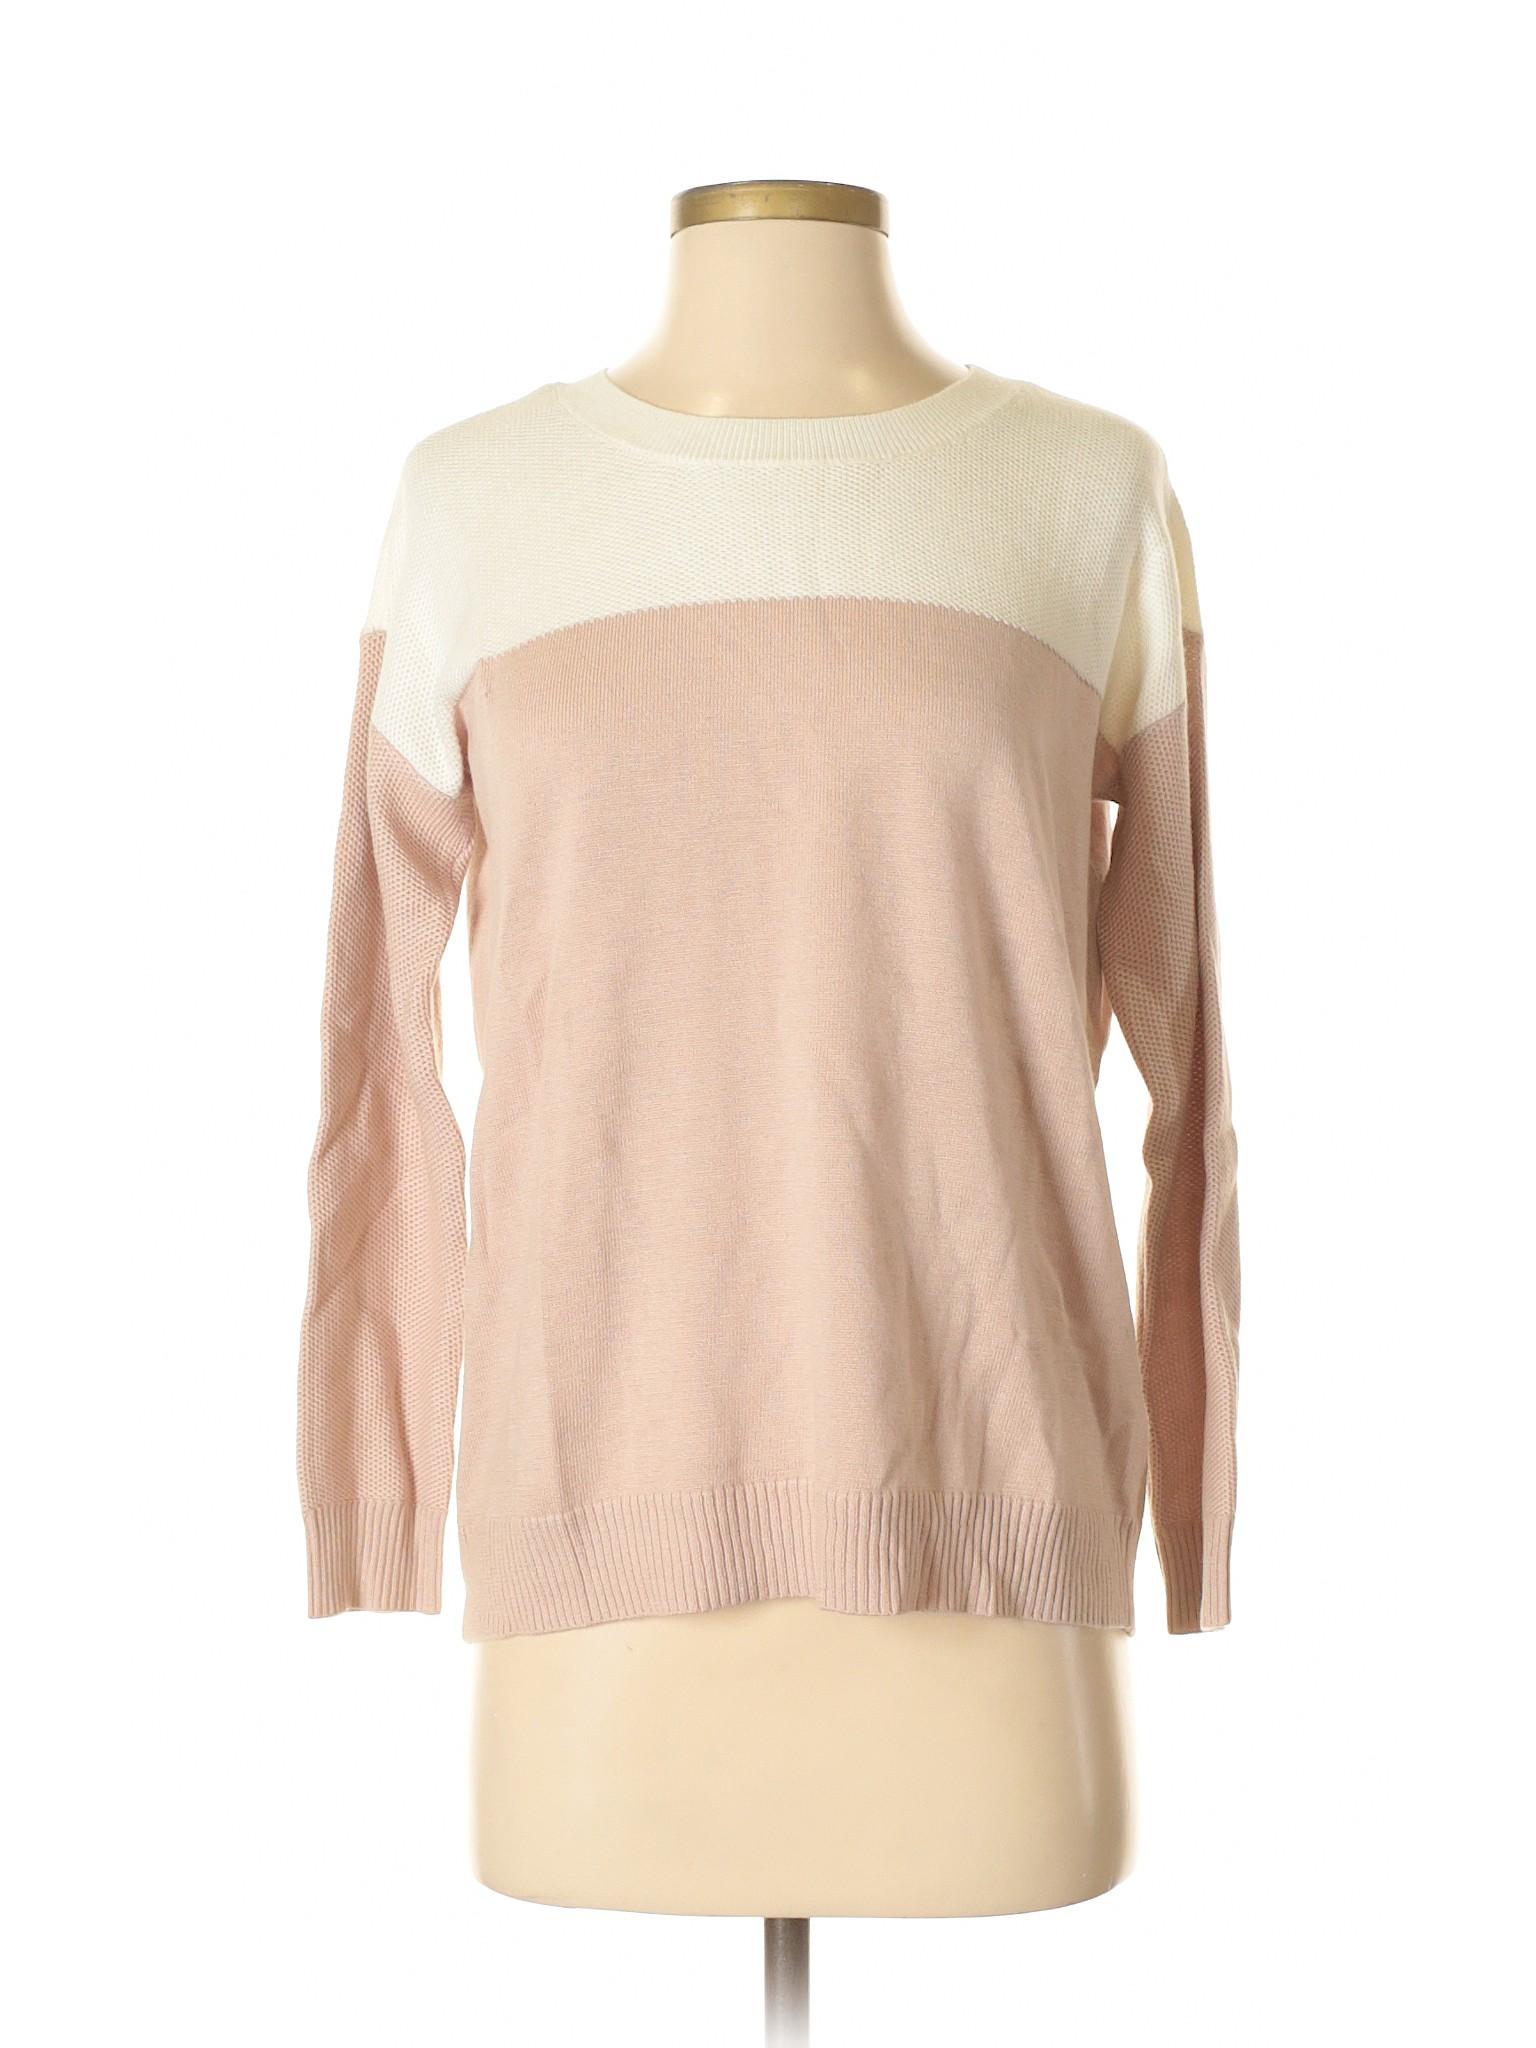 Boutique Joie Sweater Winter Winter Boutique Joie Sweater Pullover Pullover RPI8qYxO